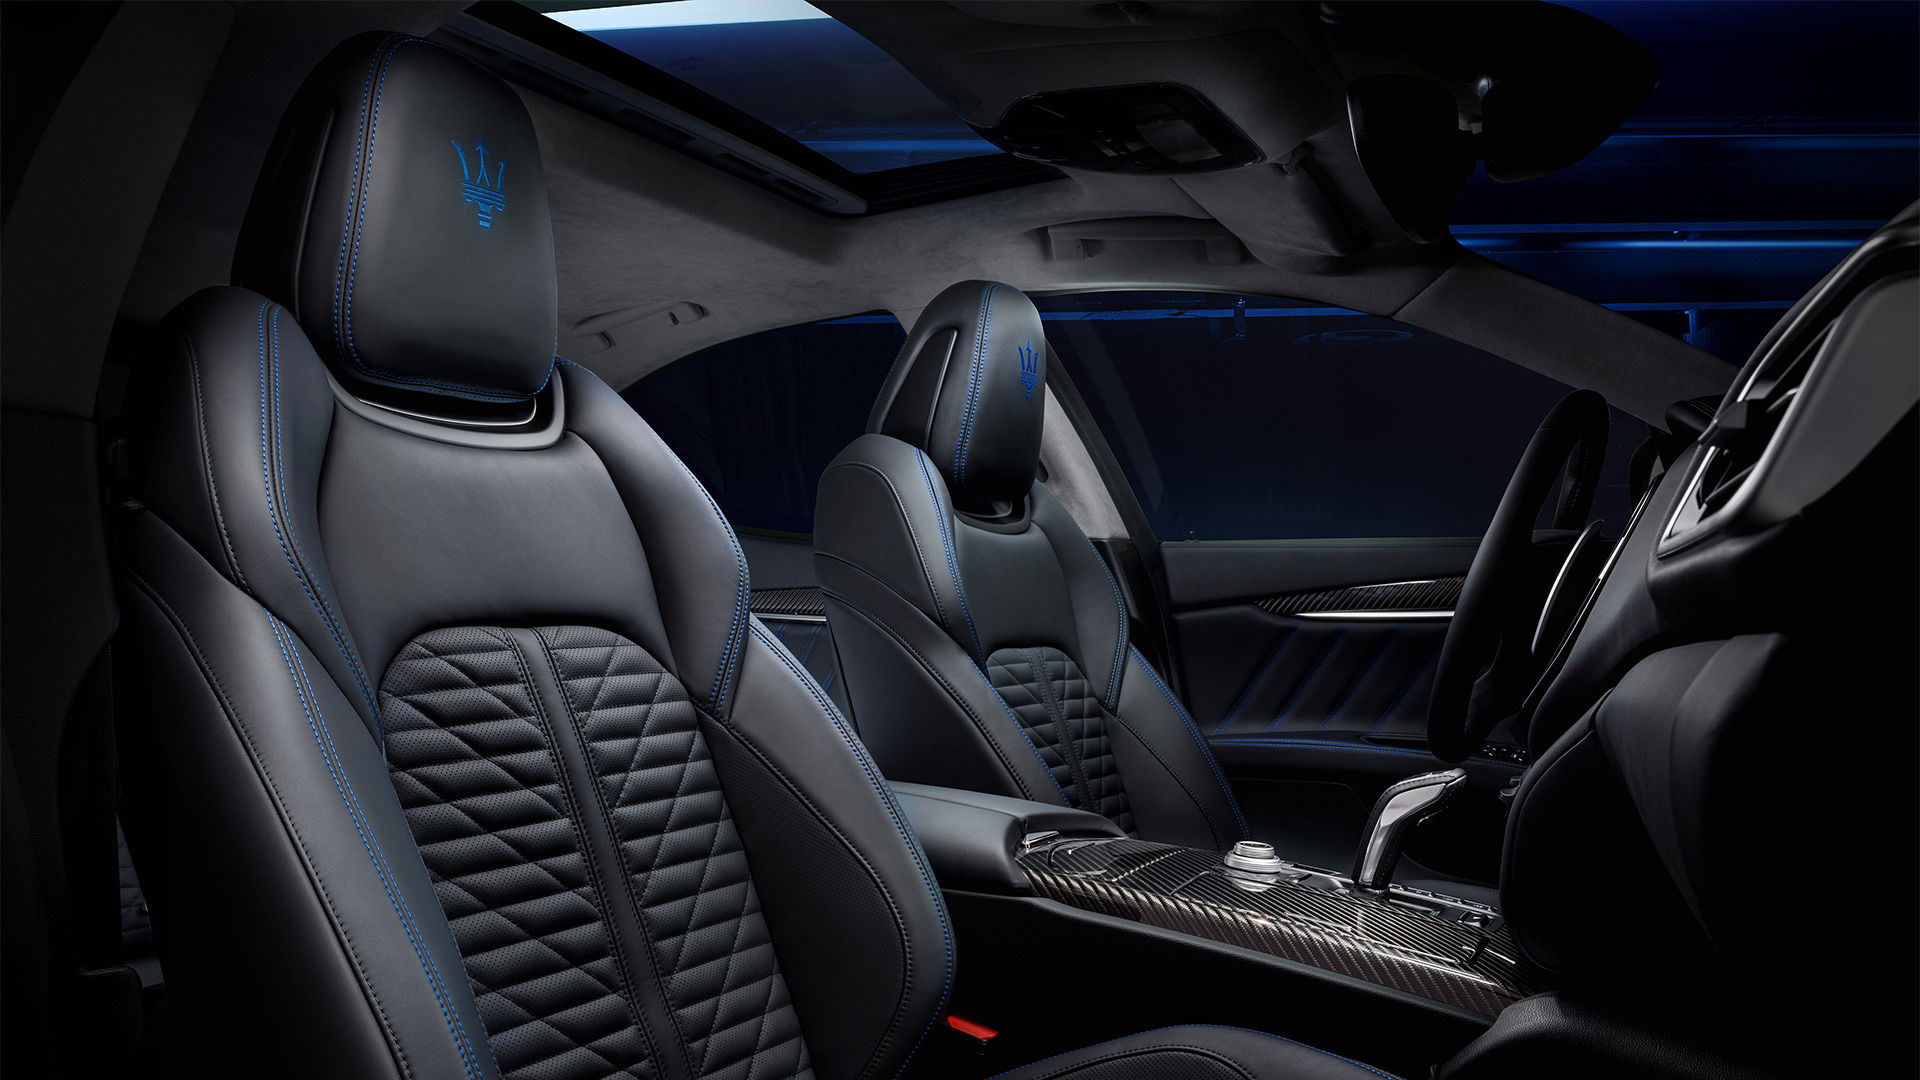 Maserati Ghibli - Grau - Interieur und Design